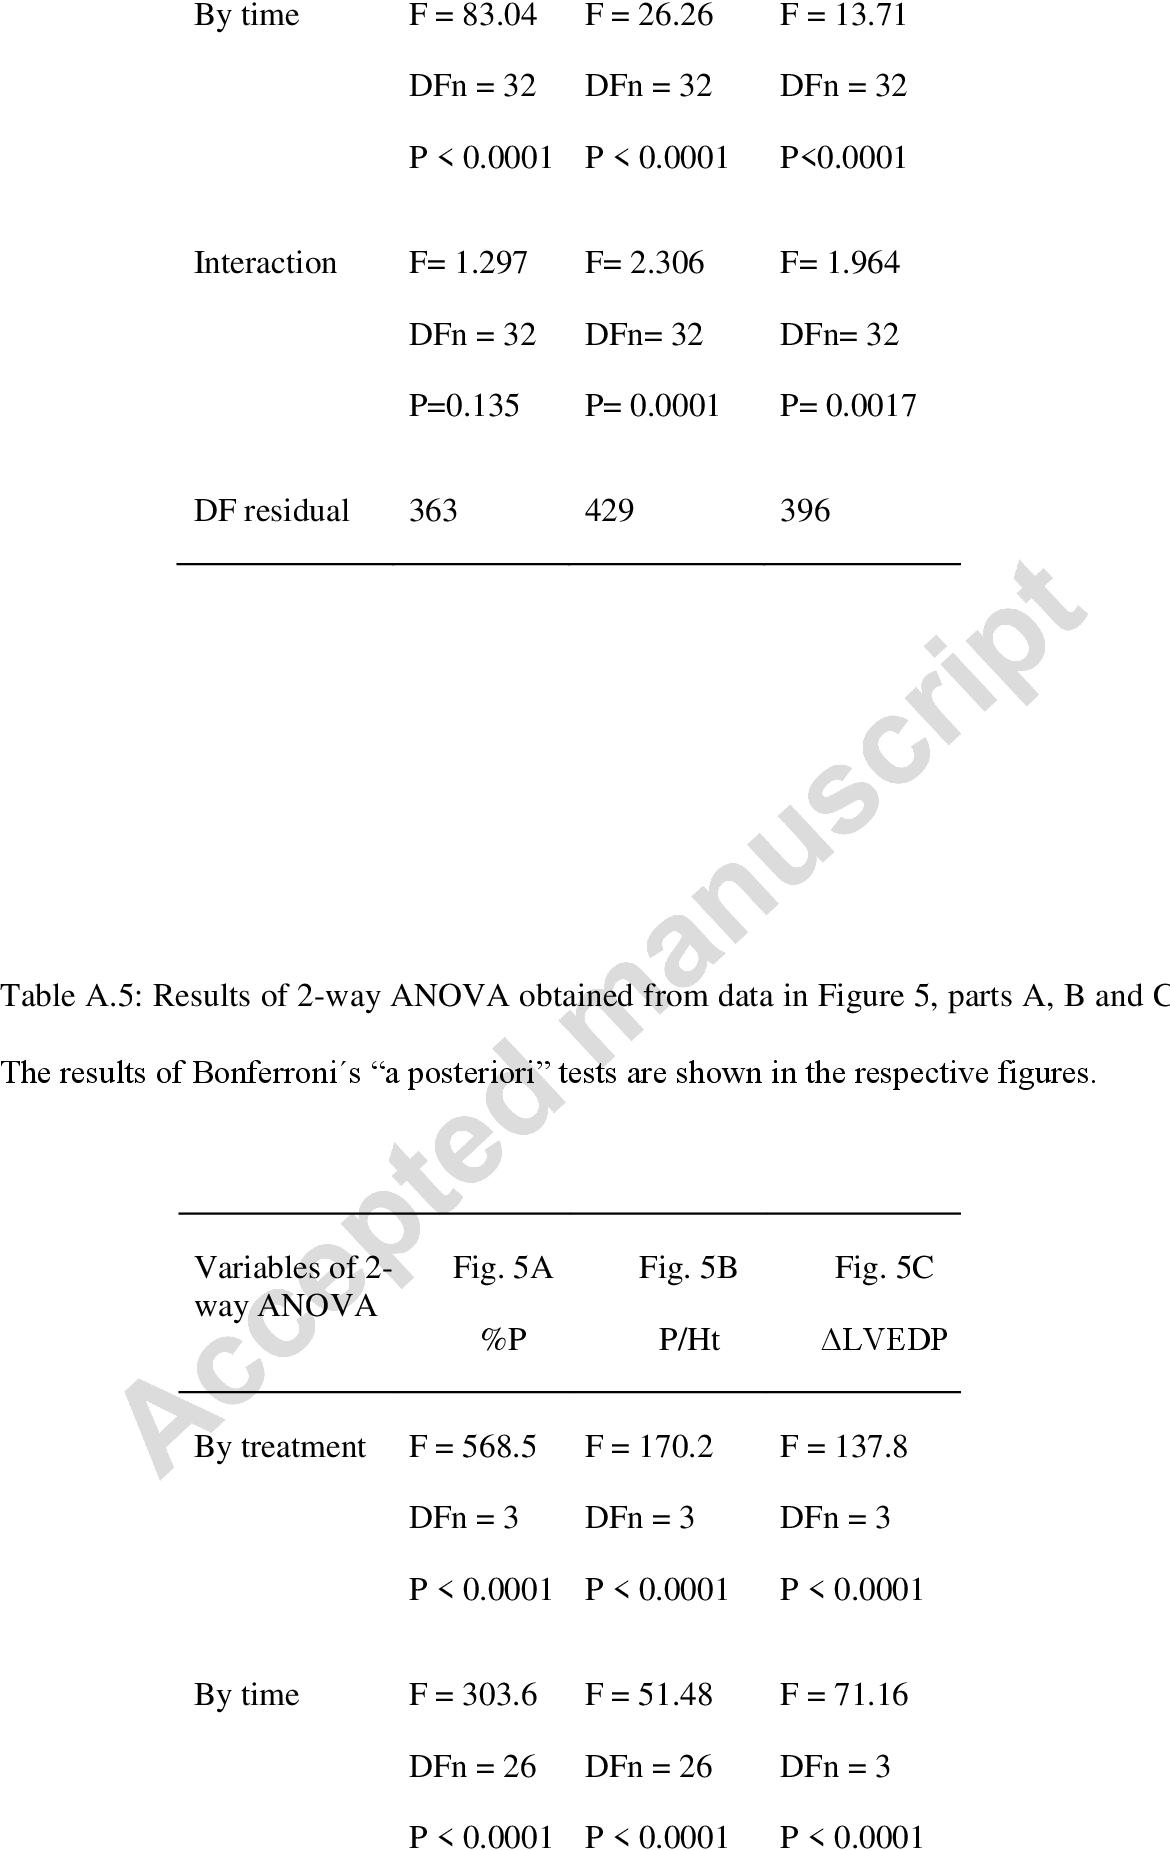 table A.5